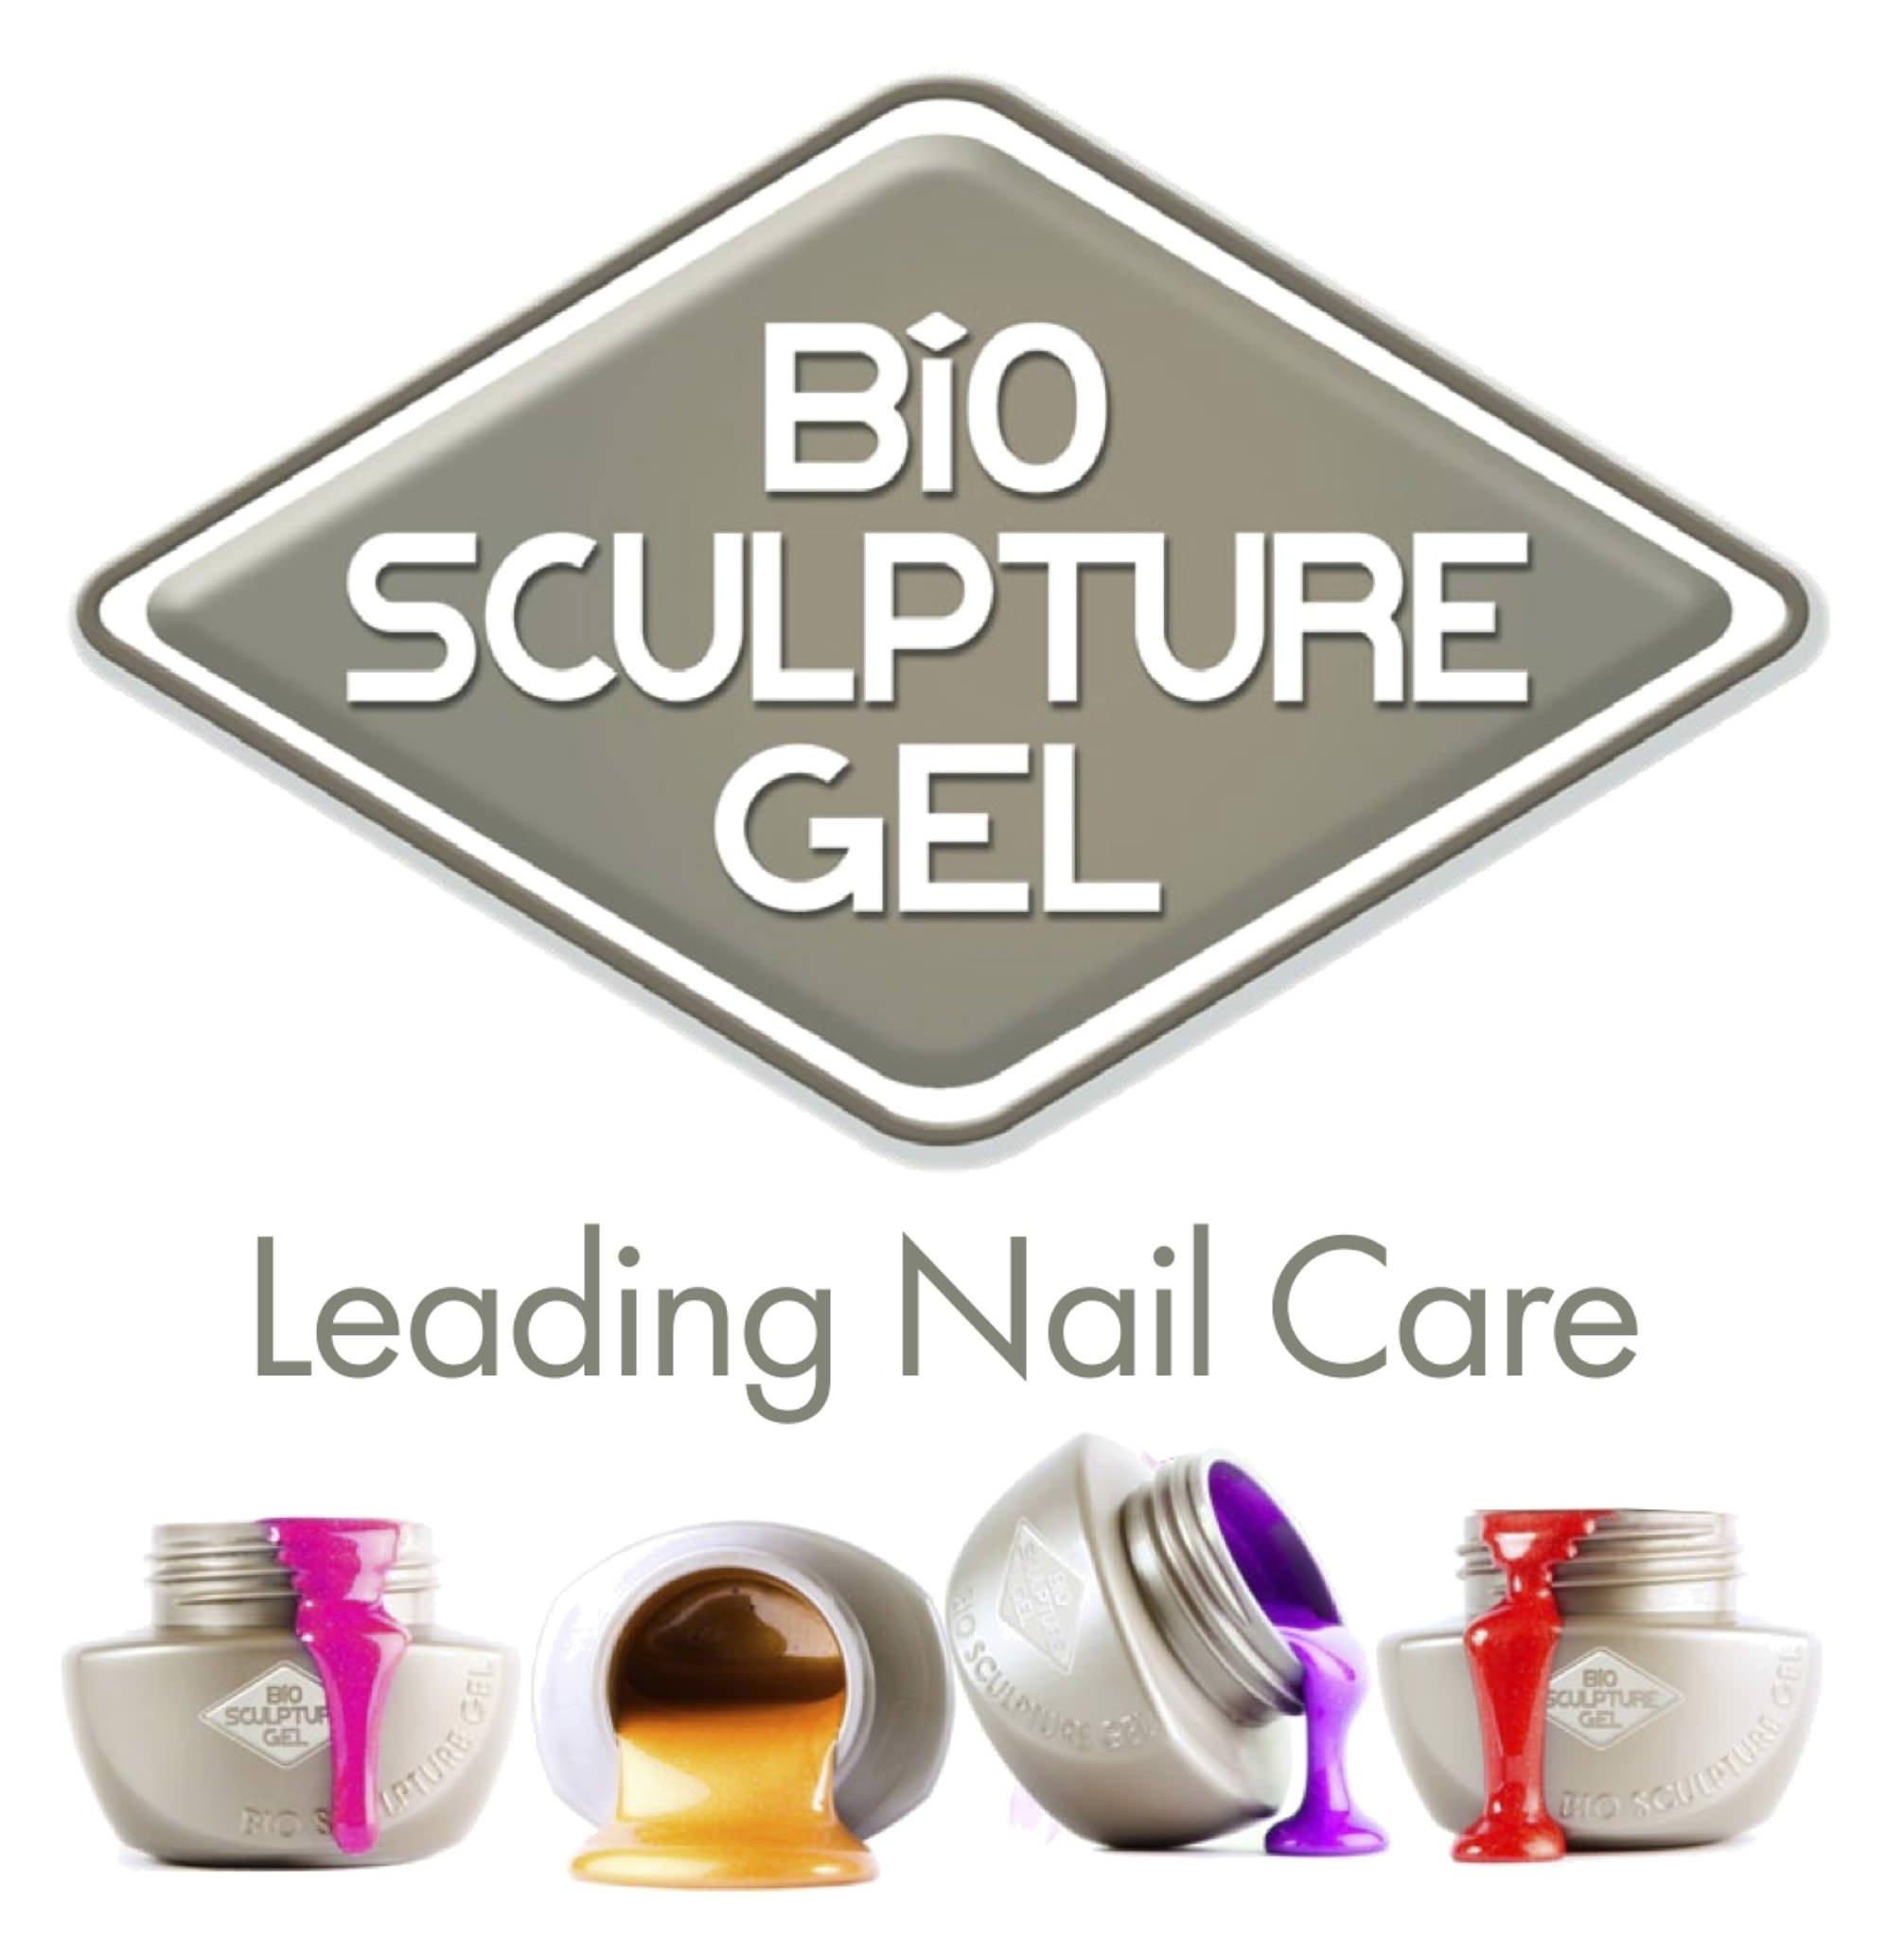 Bio Sculpture Gel Nails off/on